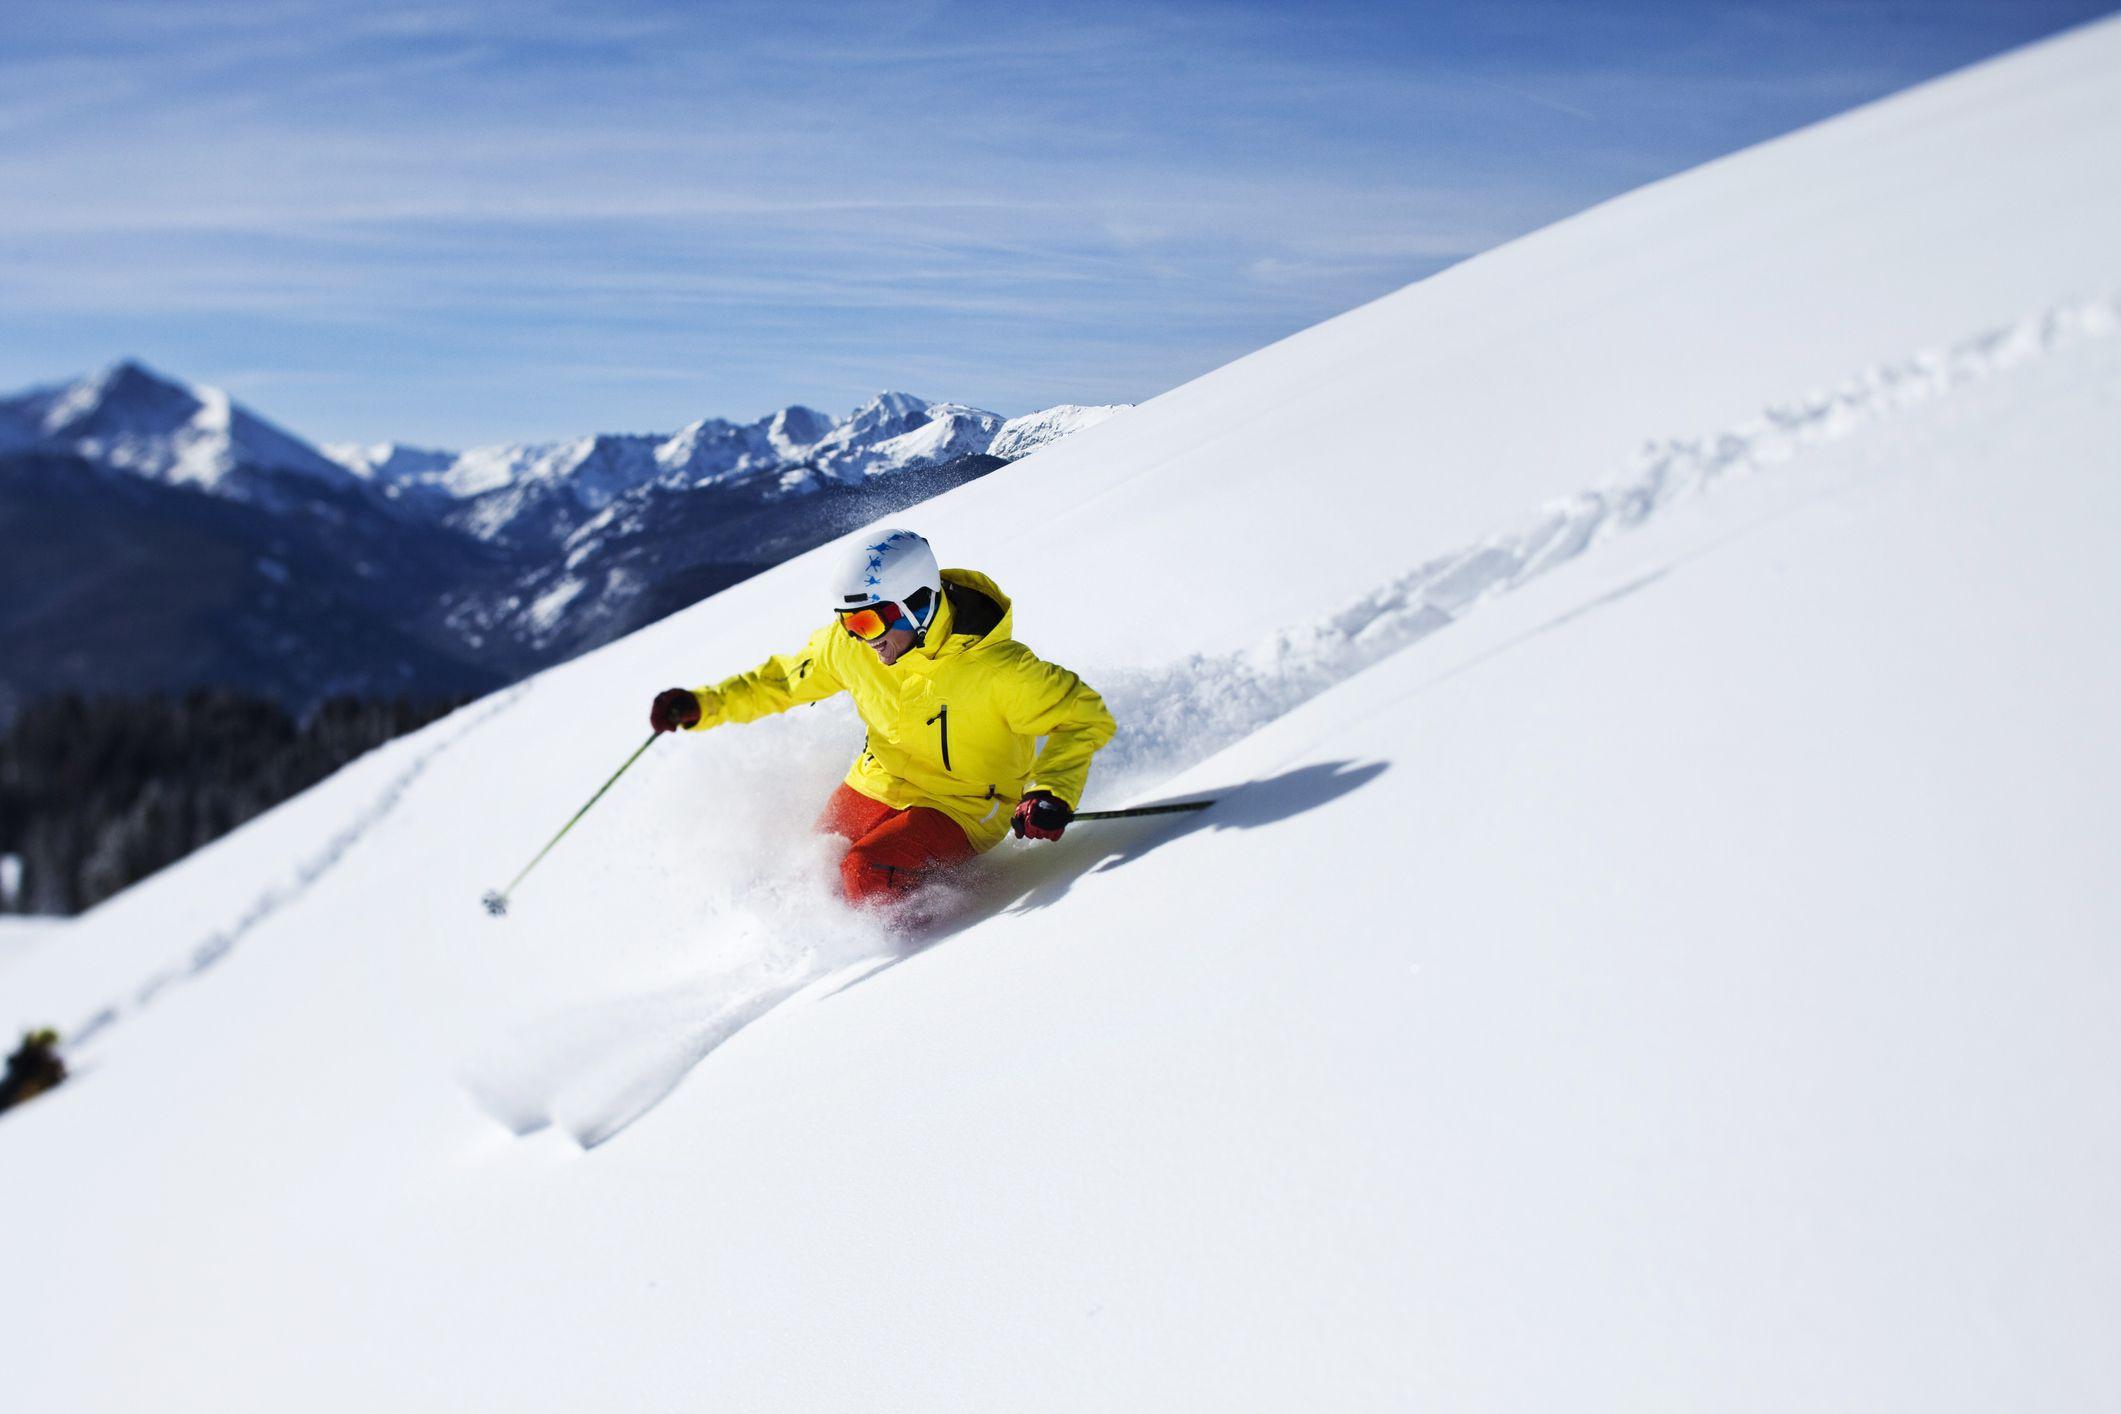 Shredding down the Colorado slopes